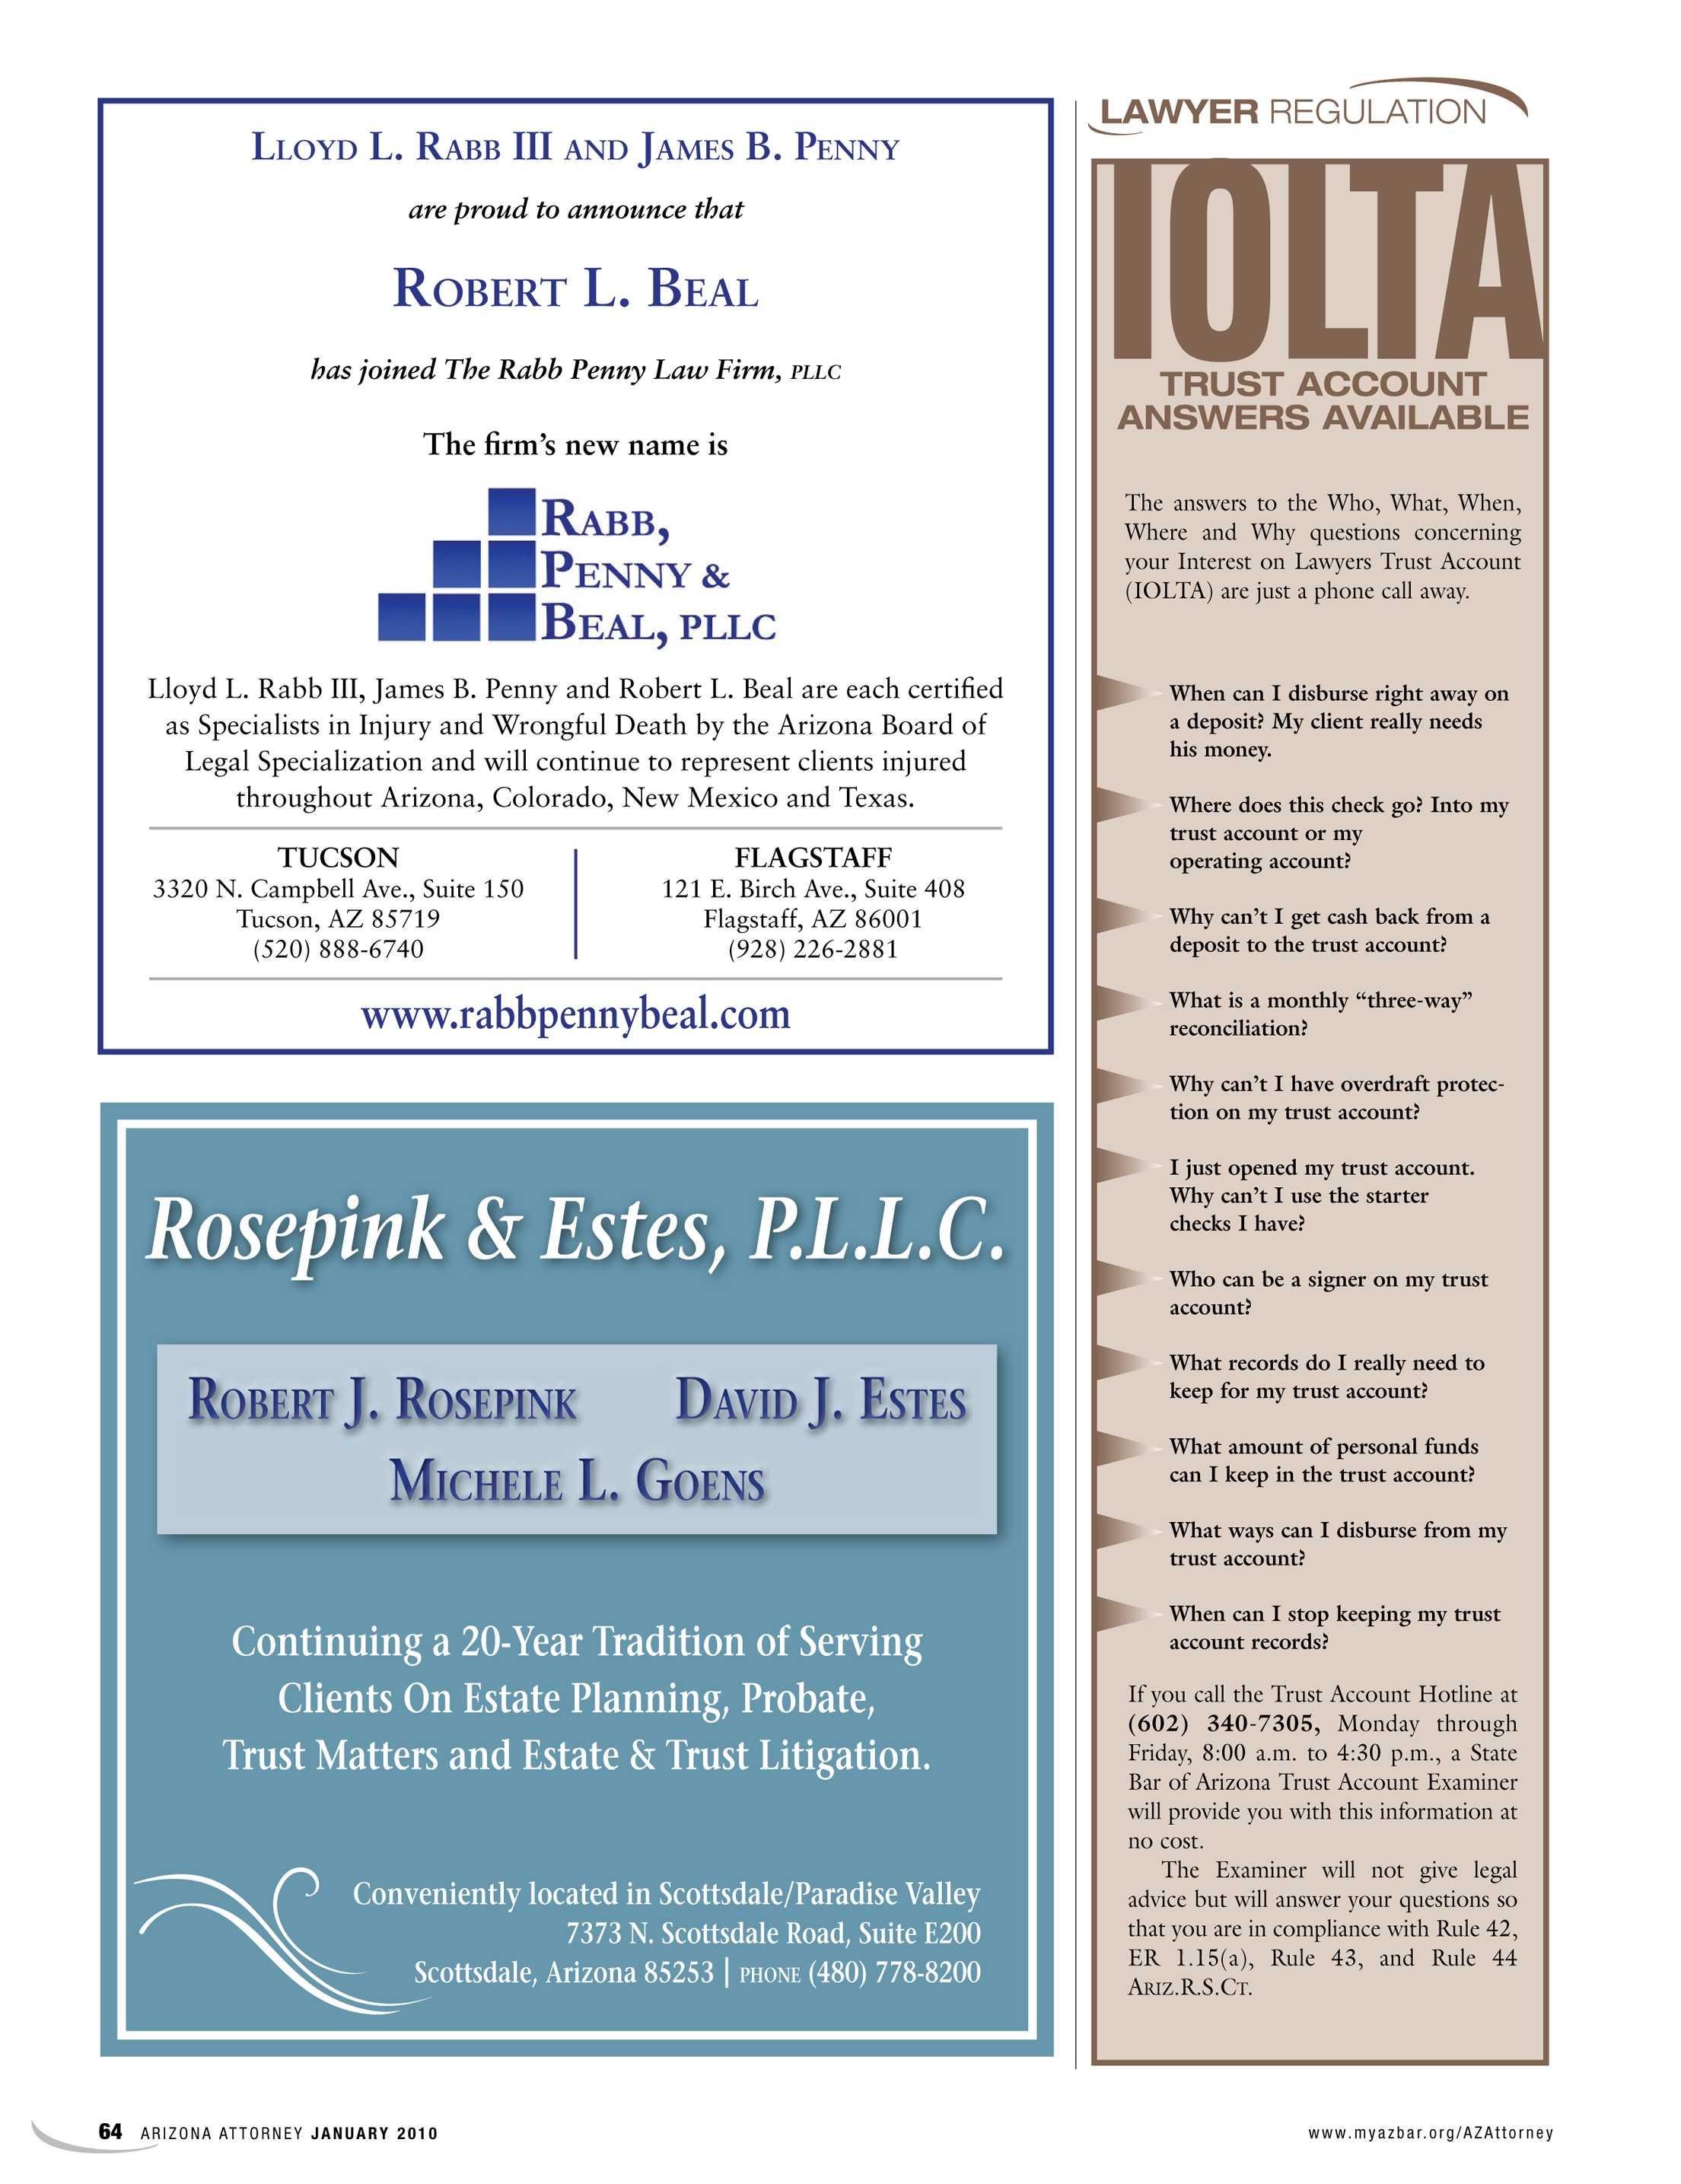 Arizona Attorney - January 2010 - page 65